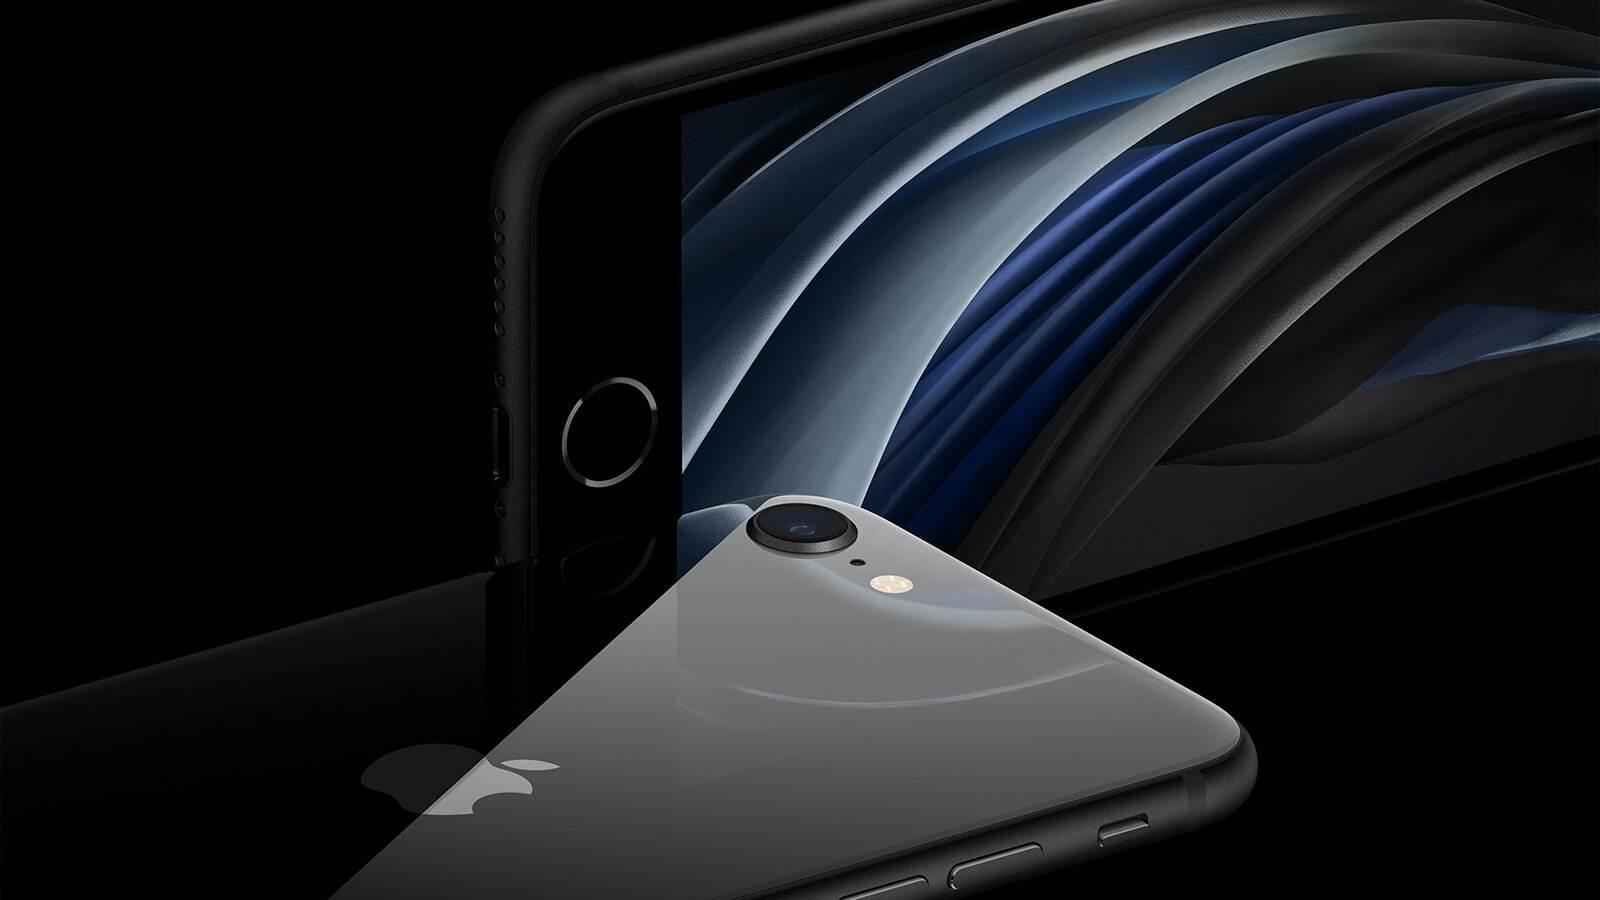 iPhone SE รุ่นปี 2020 เปิดตัวอย่างเป็นทางการแล้ว ราคาเริ่มต้น 14,900 บาท